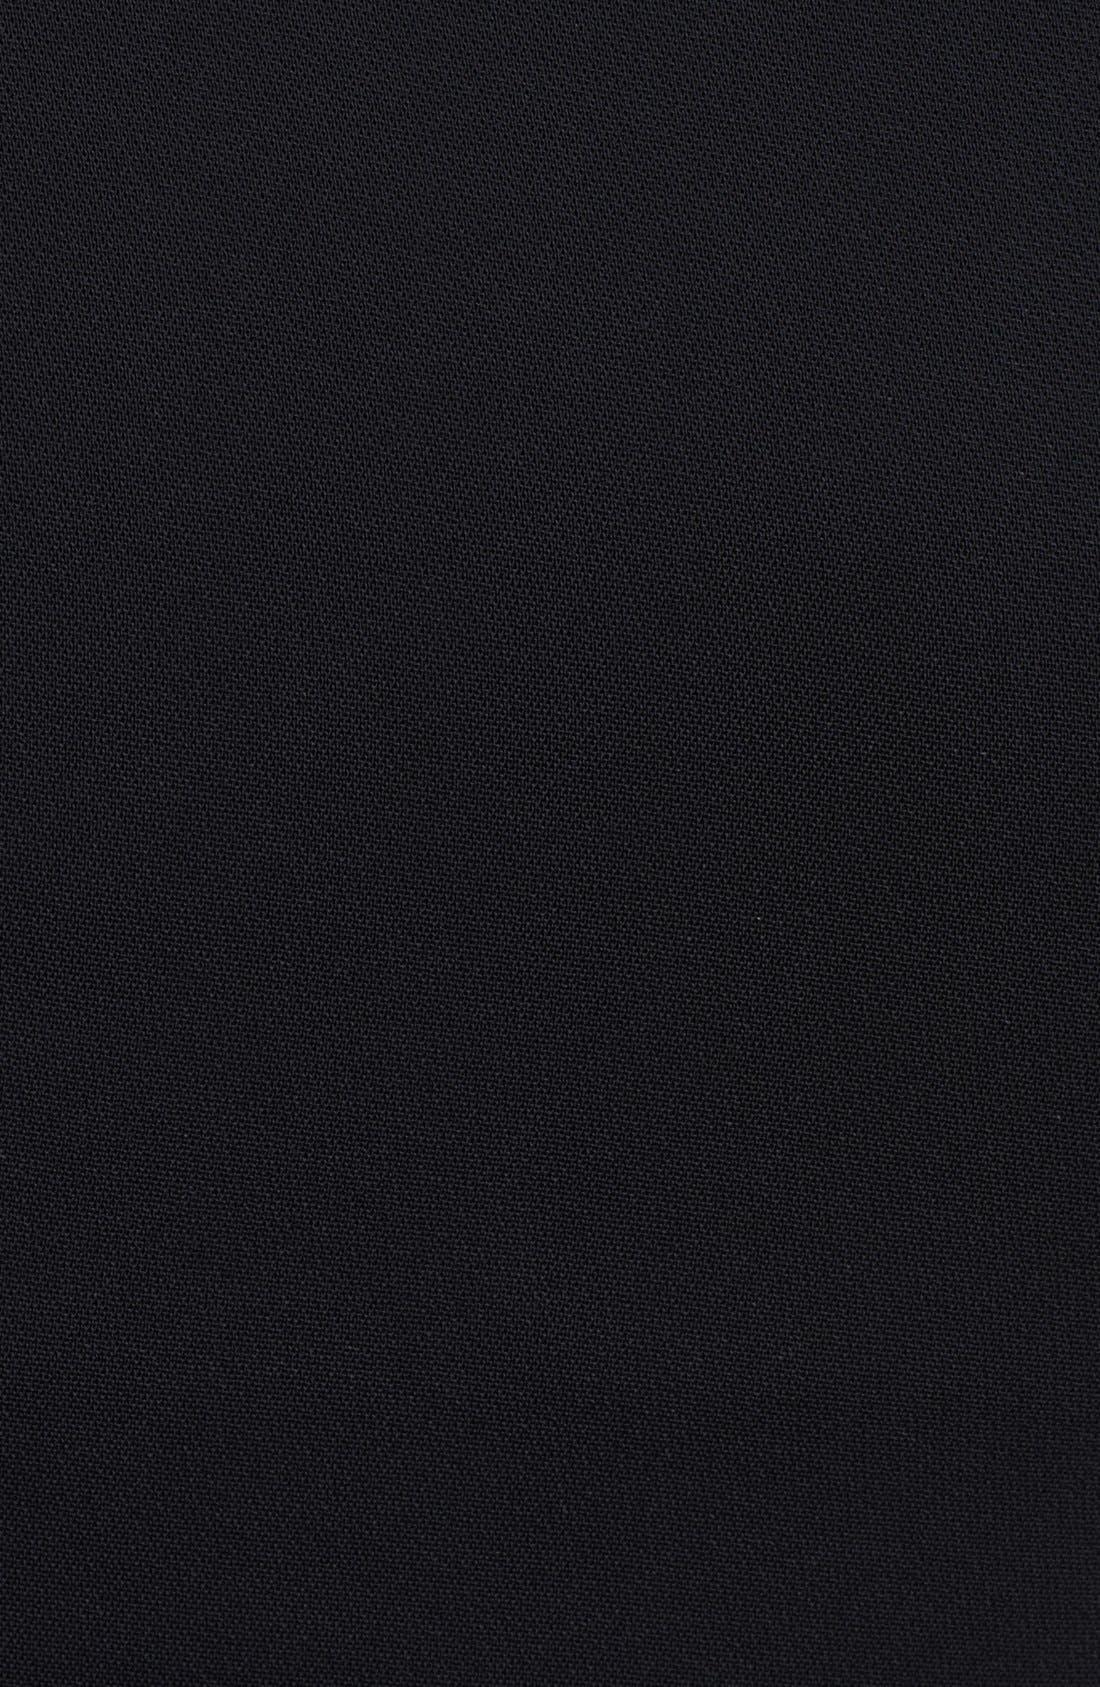 Alternate Image 3  - Emilio Pucci Side Zip Stretch Cady Dress